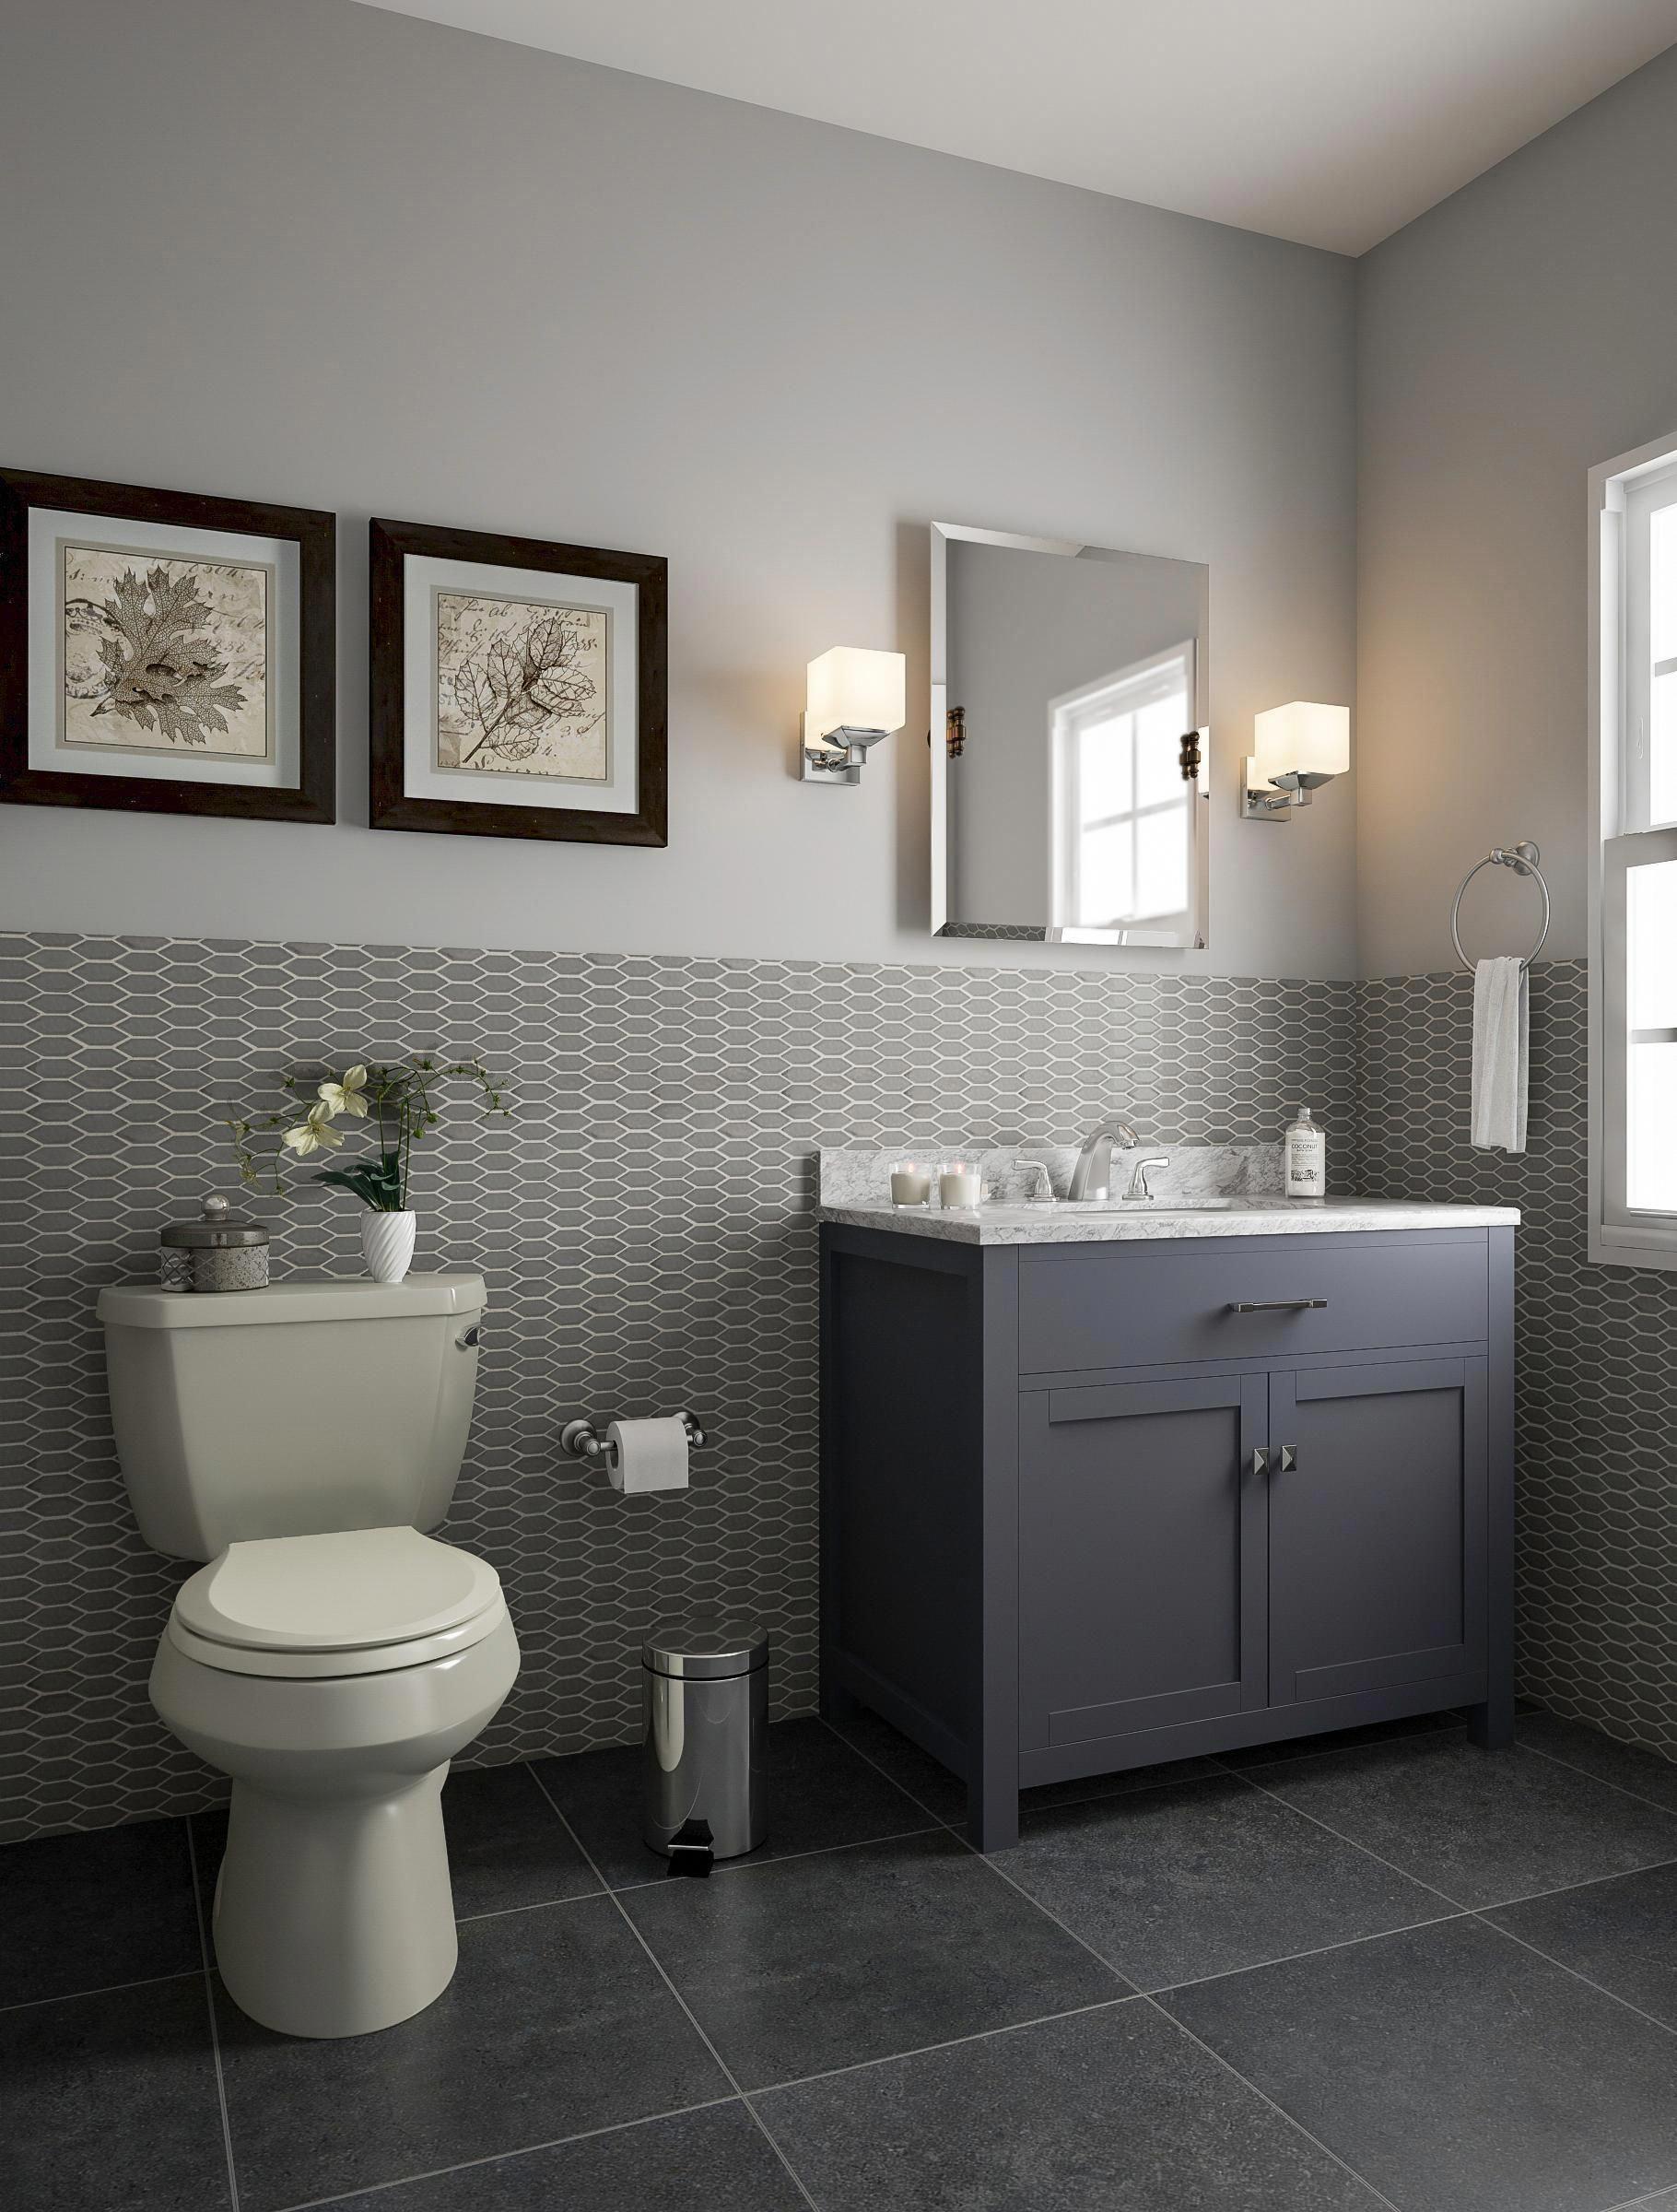 Girly Bathroom Decor Blue Bath Accessories Set Bathtub Design 20190503 Bathrooms Remodel Small Bathroom Ideas On A Budget Small Bathroom Vanities